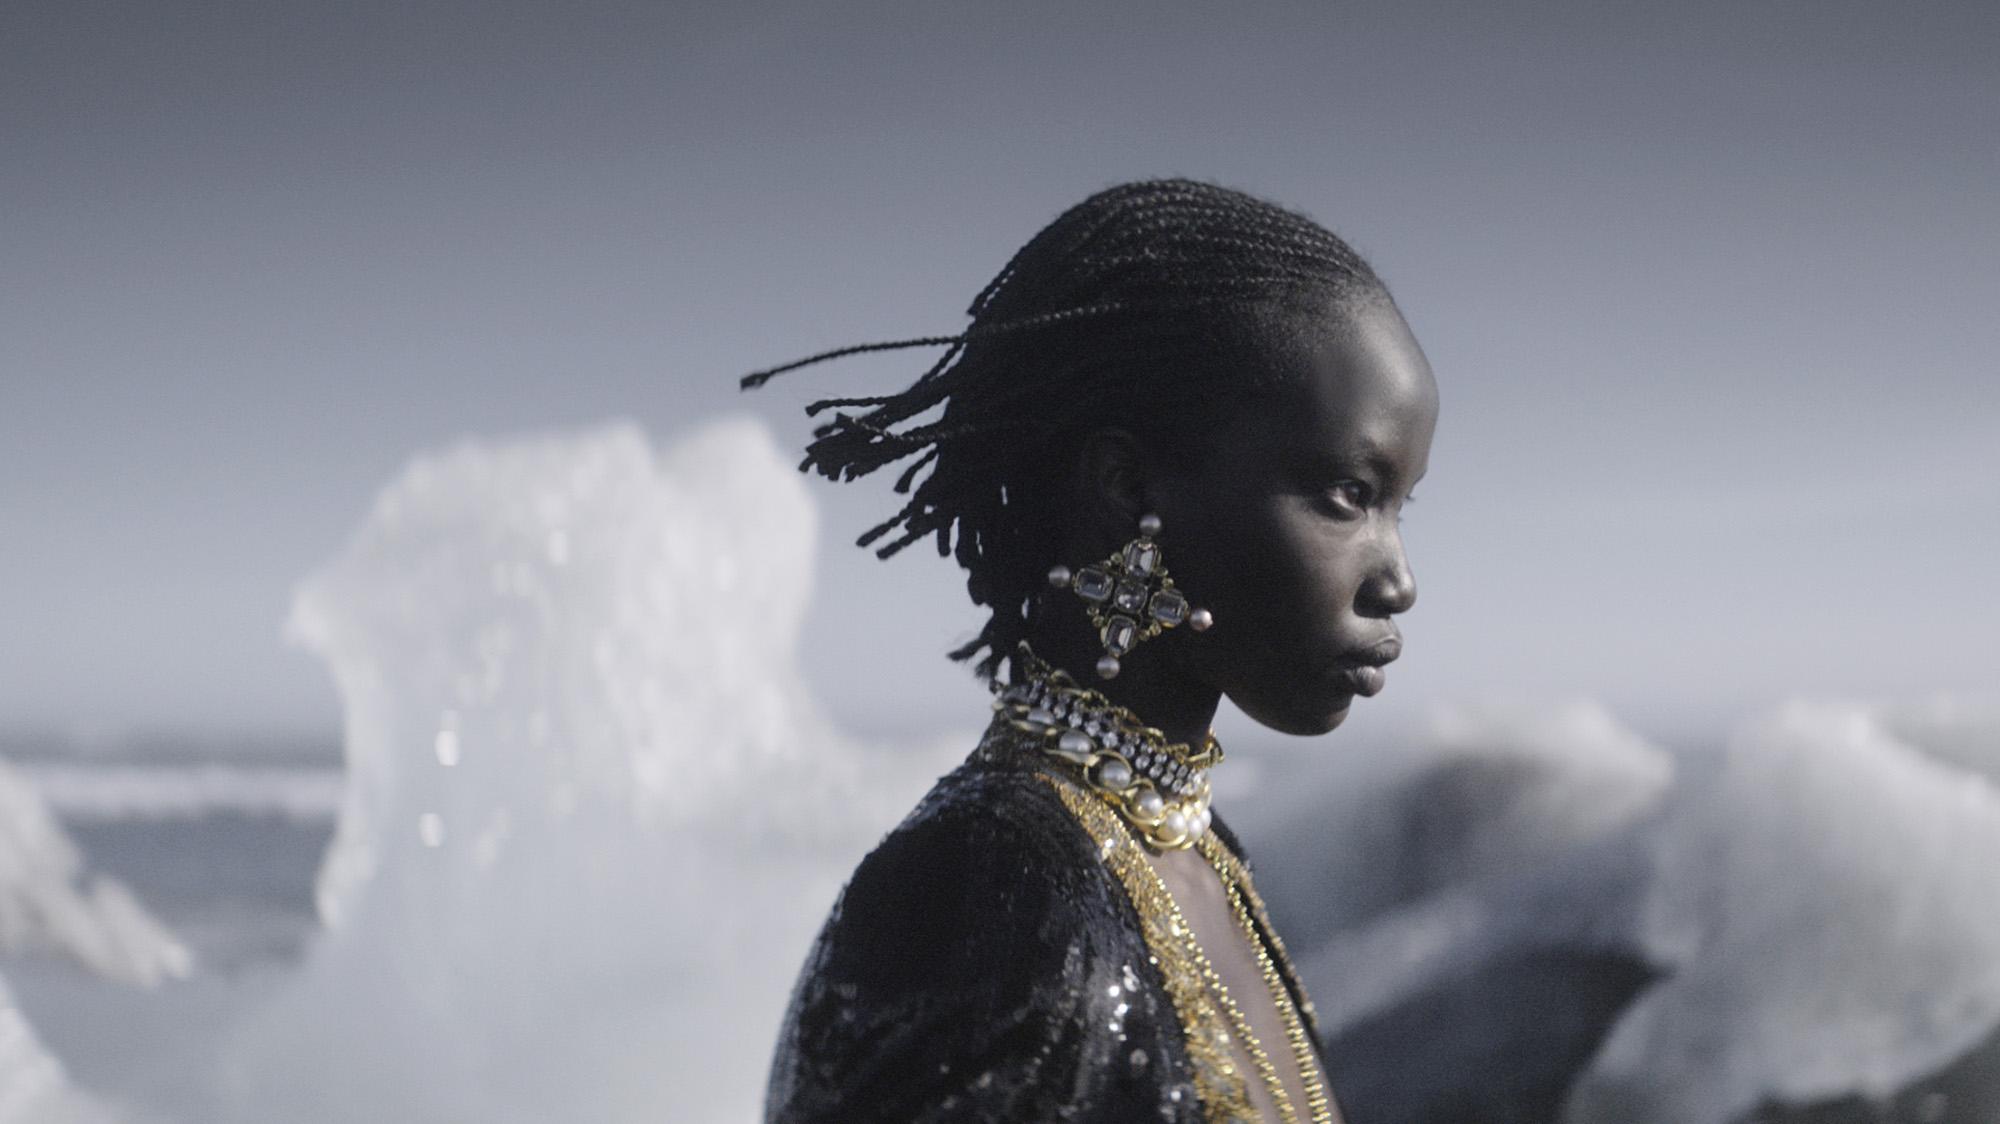 Saint Laurent honors the awe-inspiring intensity of nature and the feminine